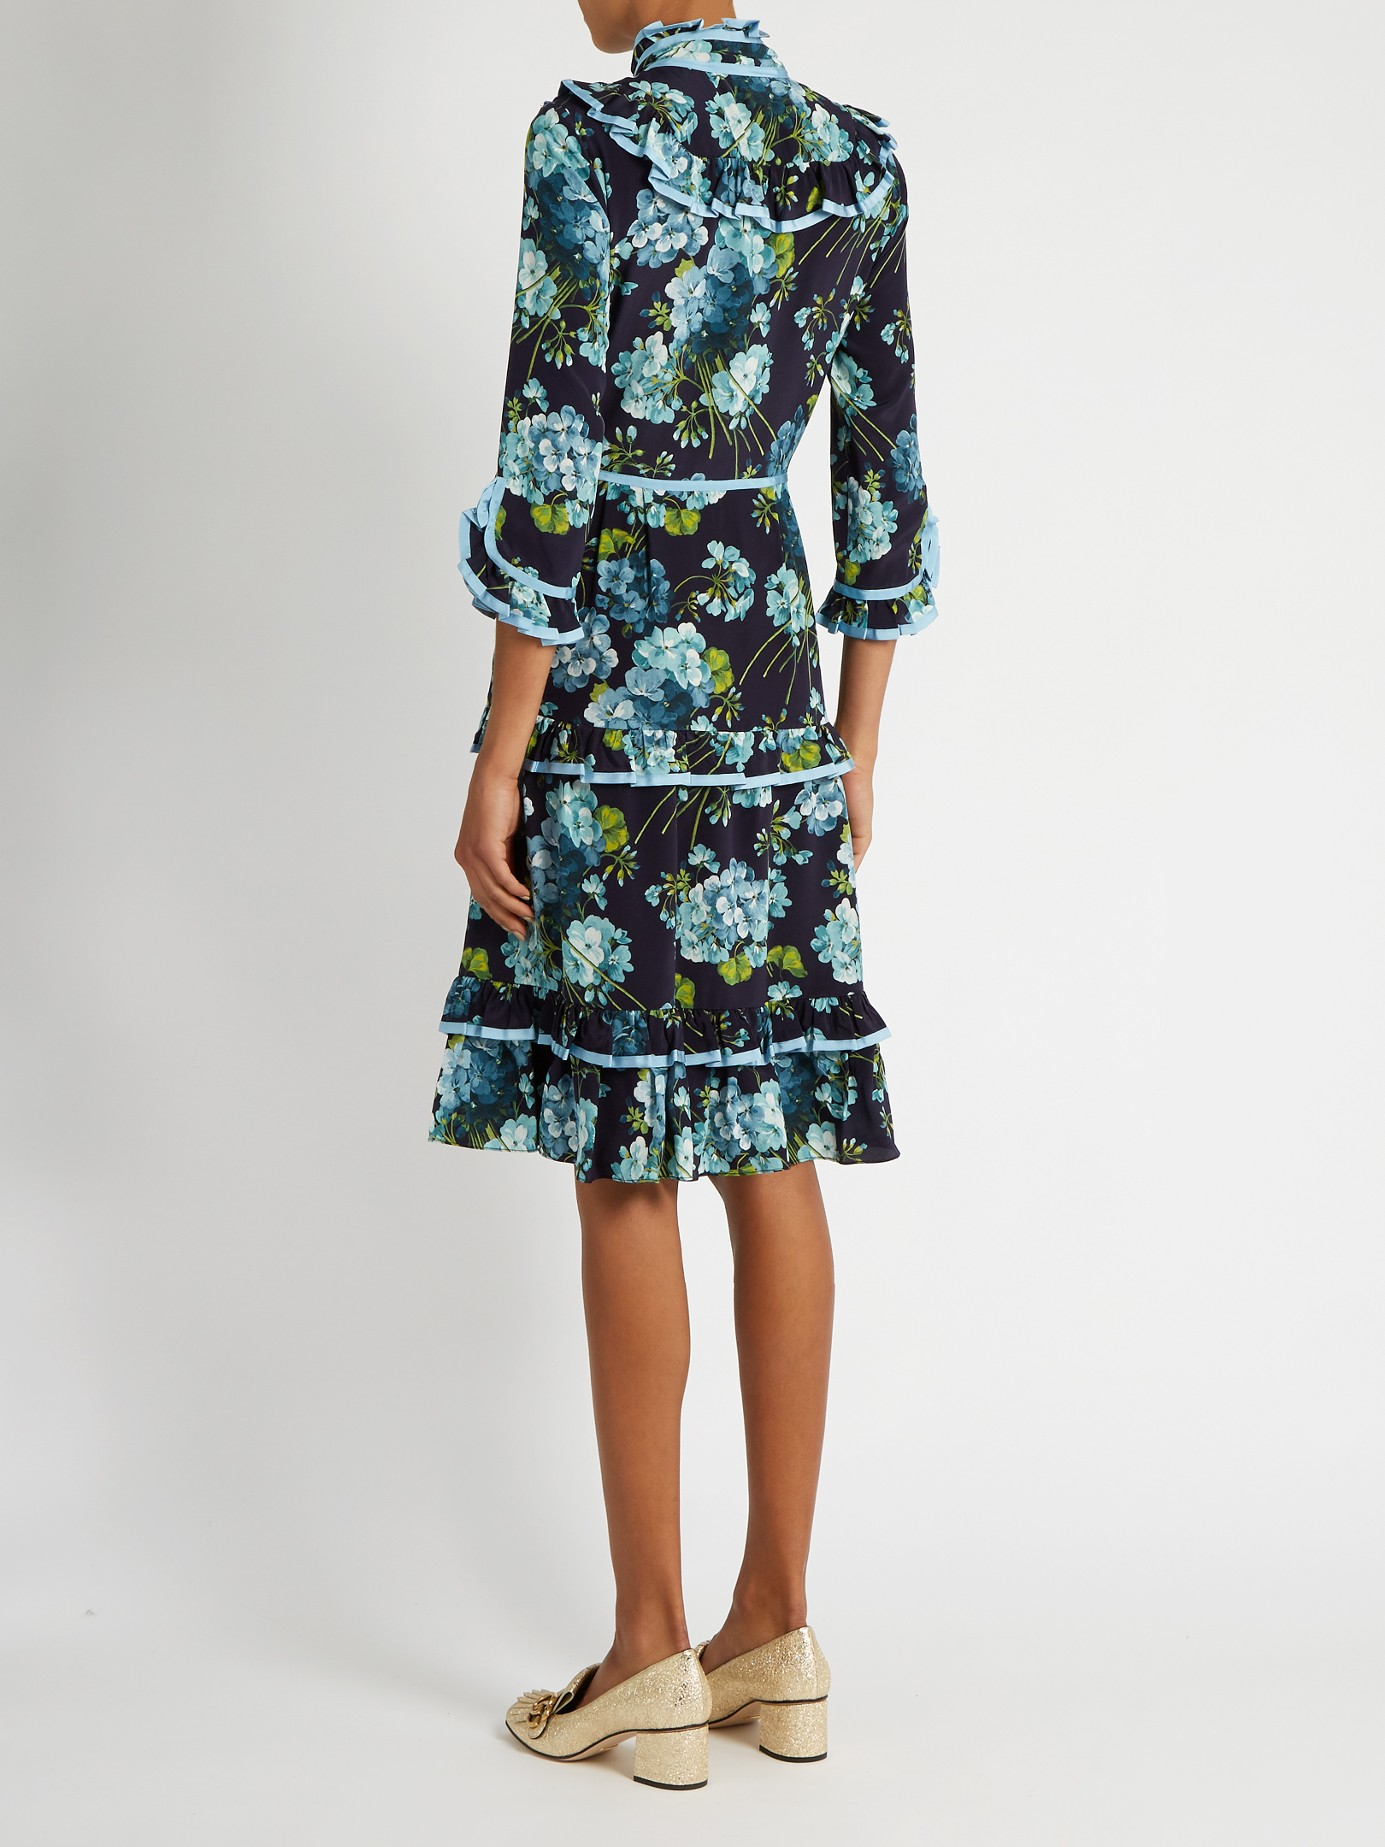 23a7e353437bd5 Gucci Blooms-print Crepe De Chine Dress in Blue - Lyst